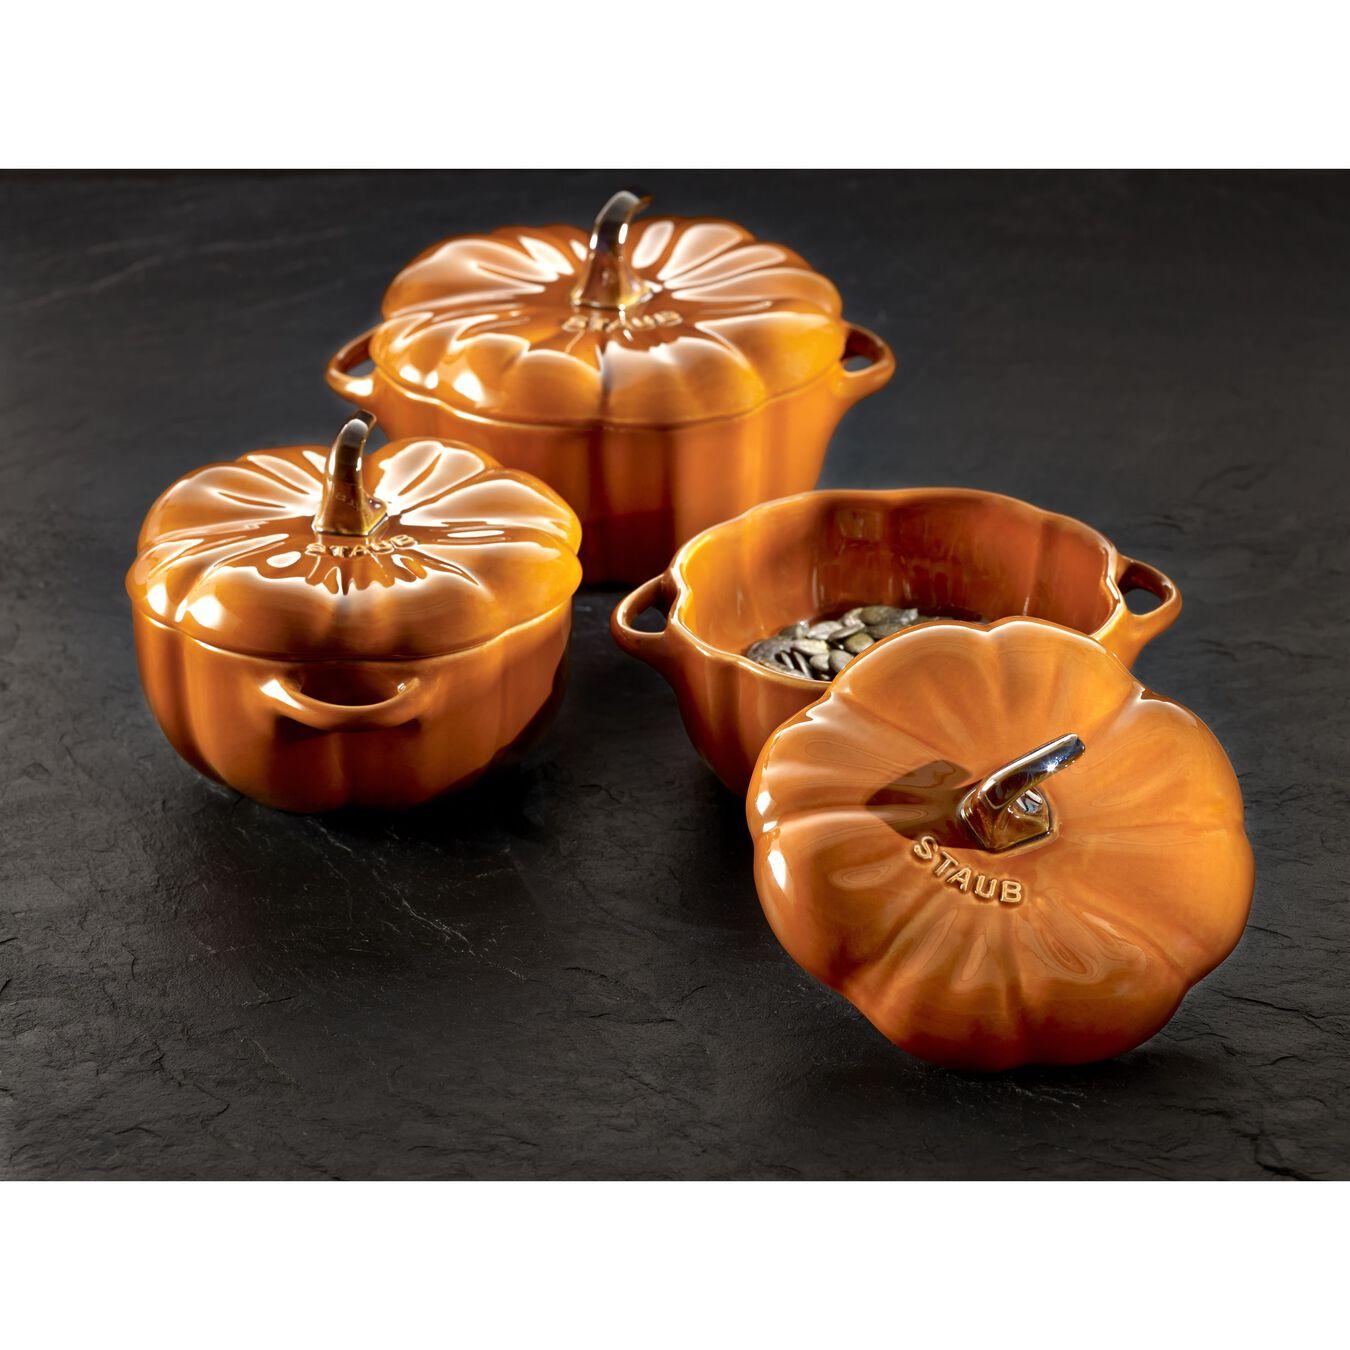 16-oz Petite Pumpkin Cocotte - Burnt Orange,,large 4